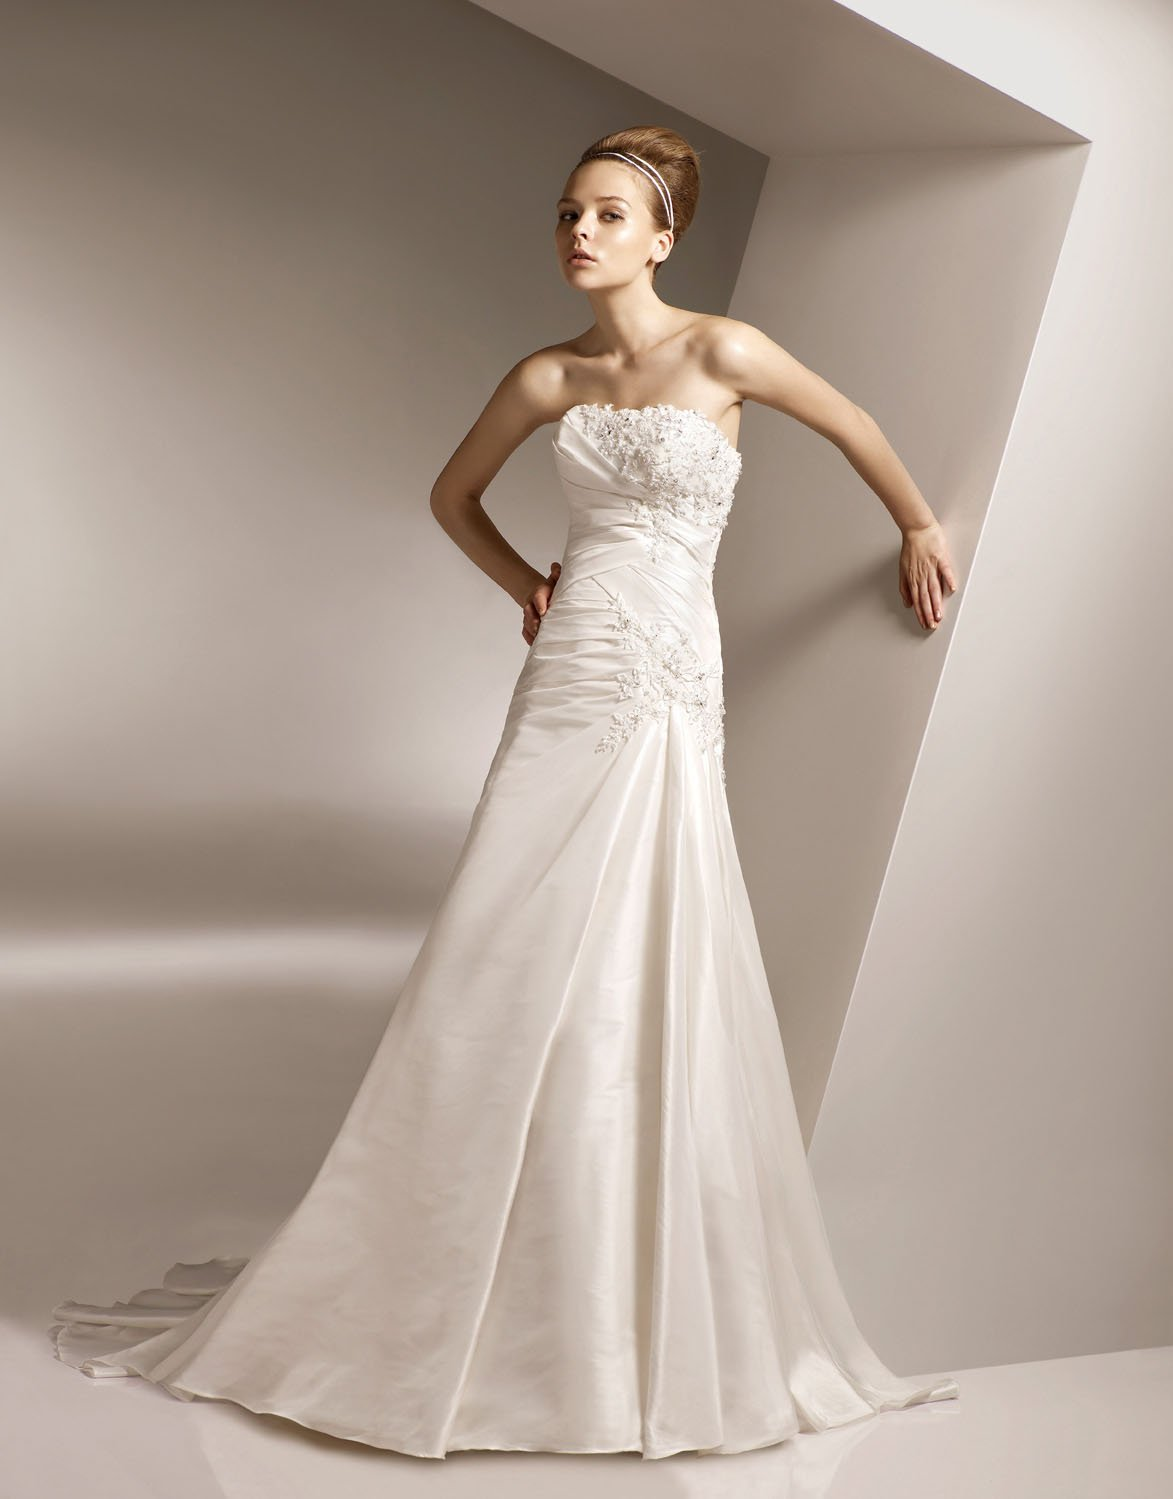 Sheath Strapless Appliqued Beading Taffeta Wedding Dress Bridal Gown